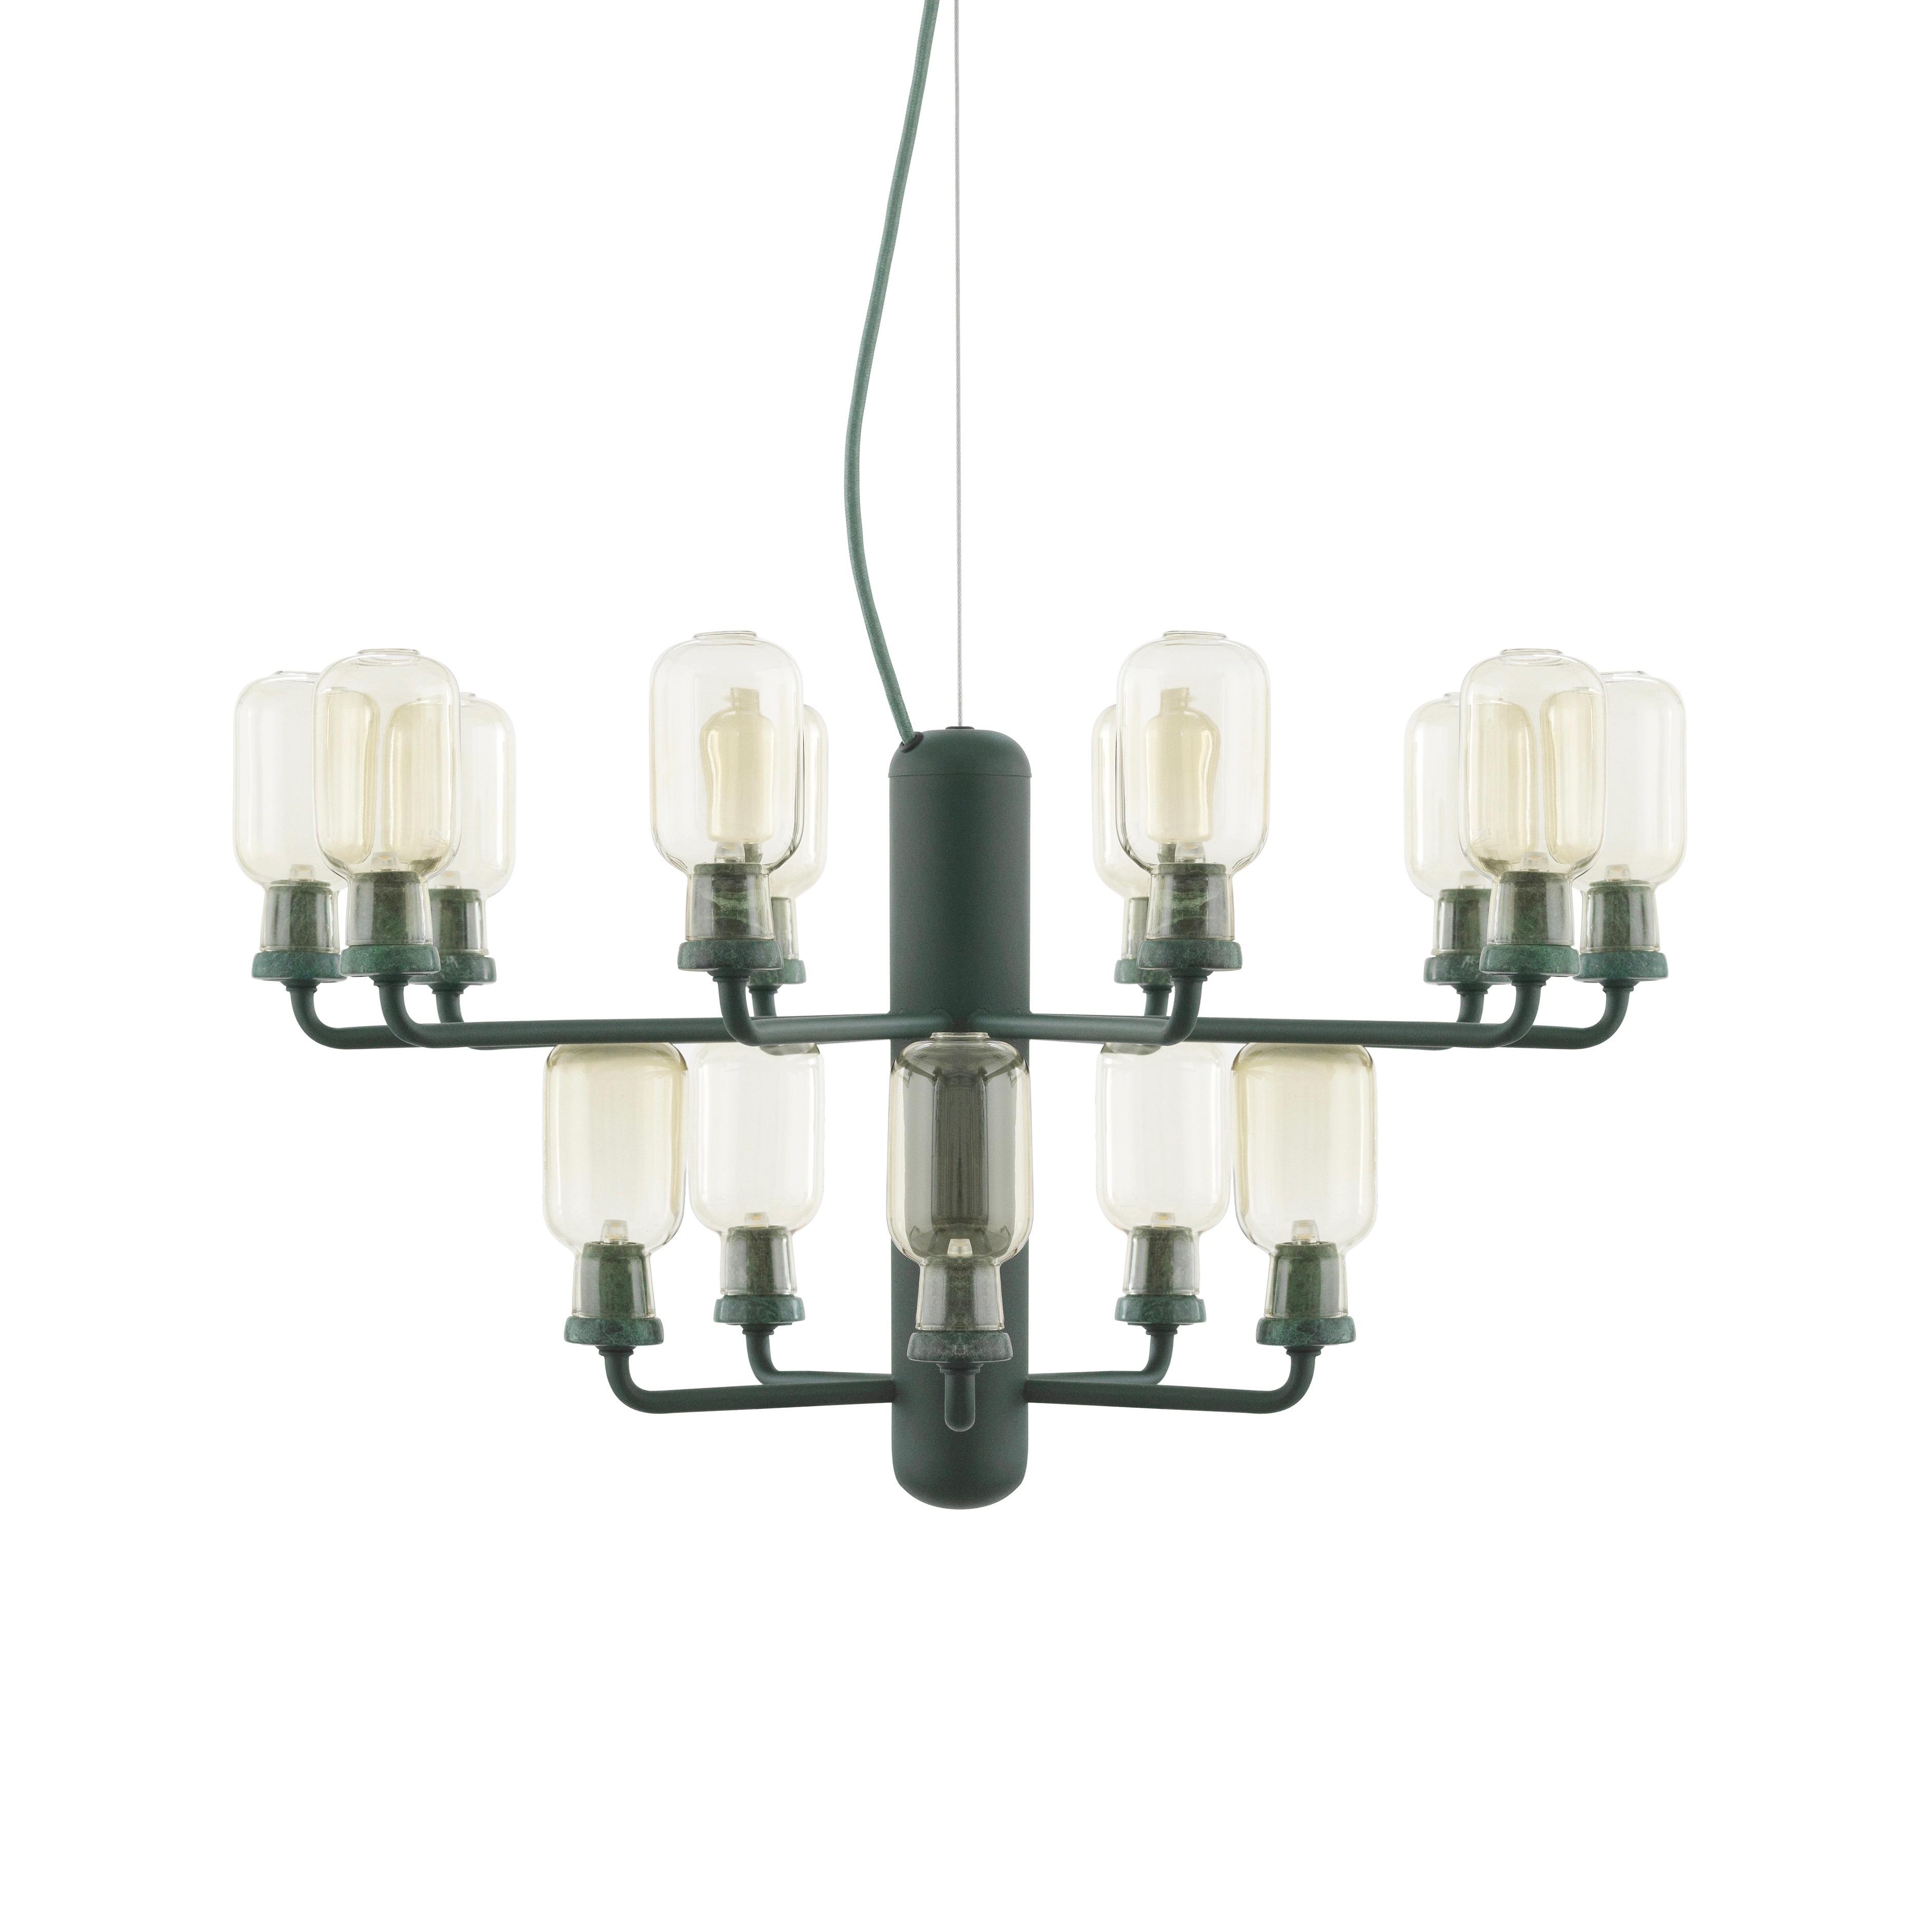 Amp chandelier S gold/green